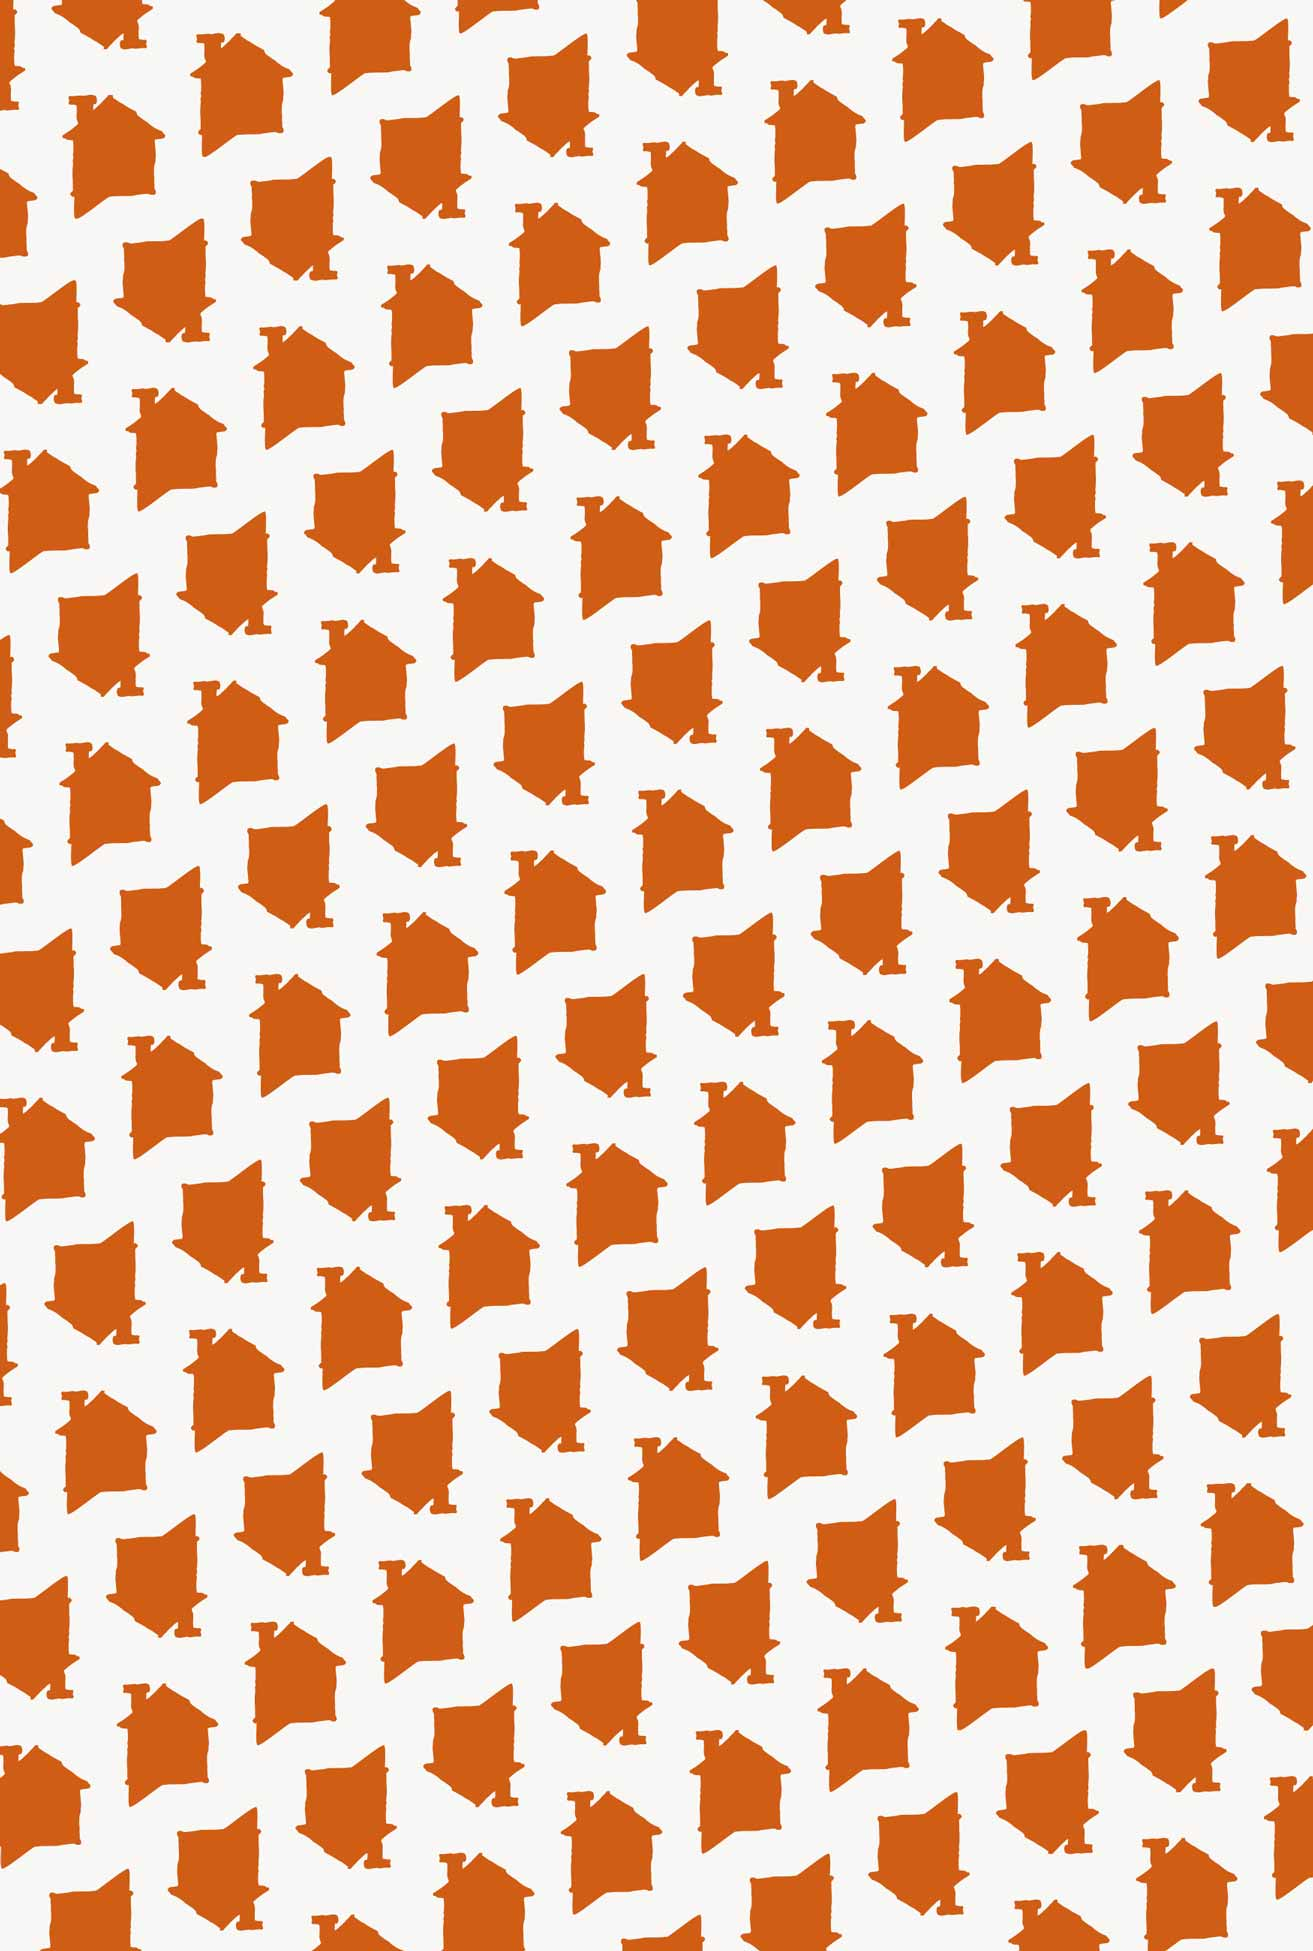 theworklodge-vert_pattern.jpg